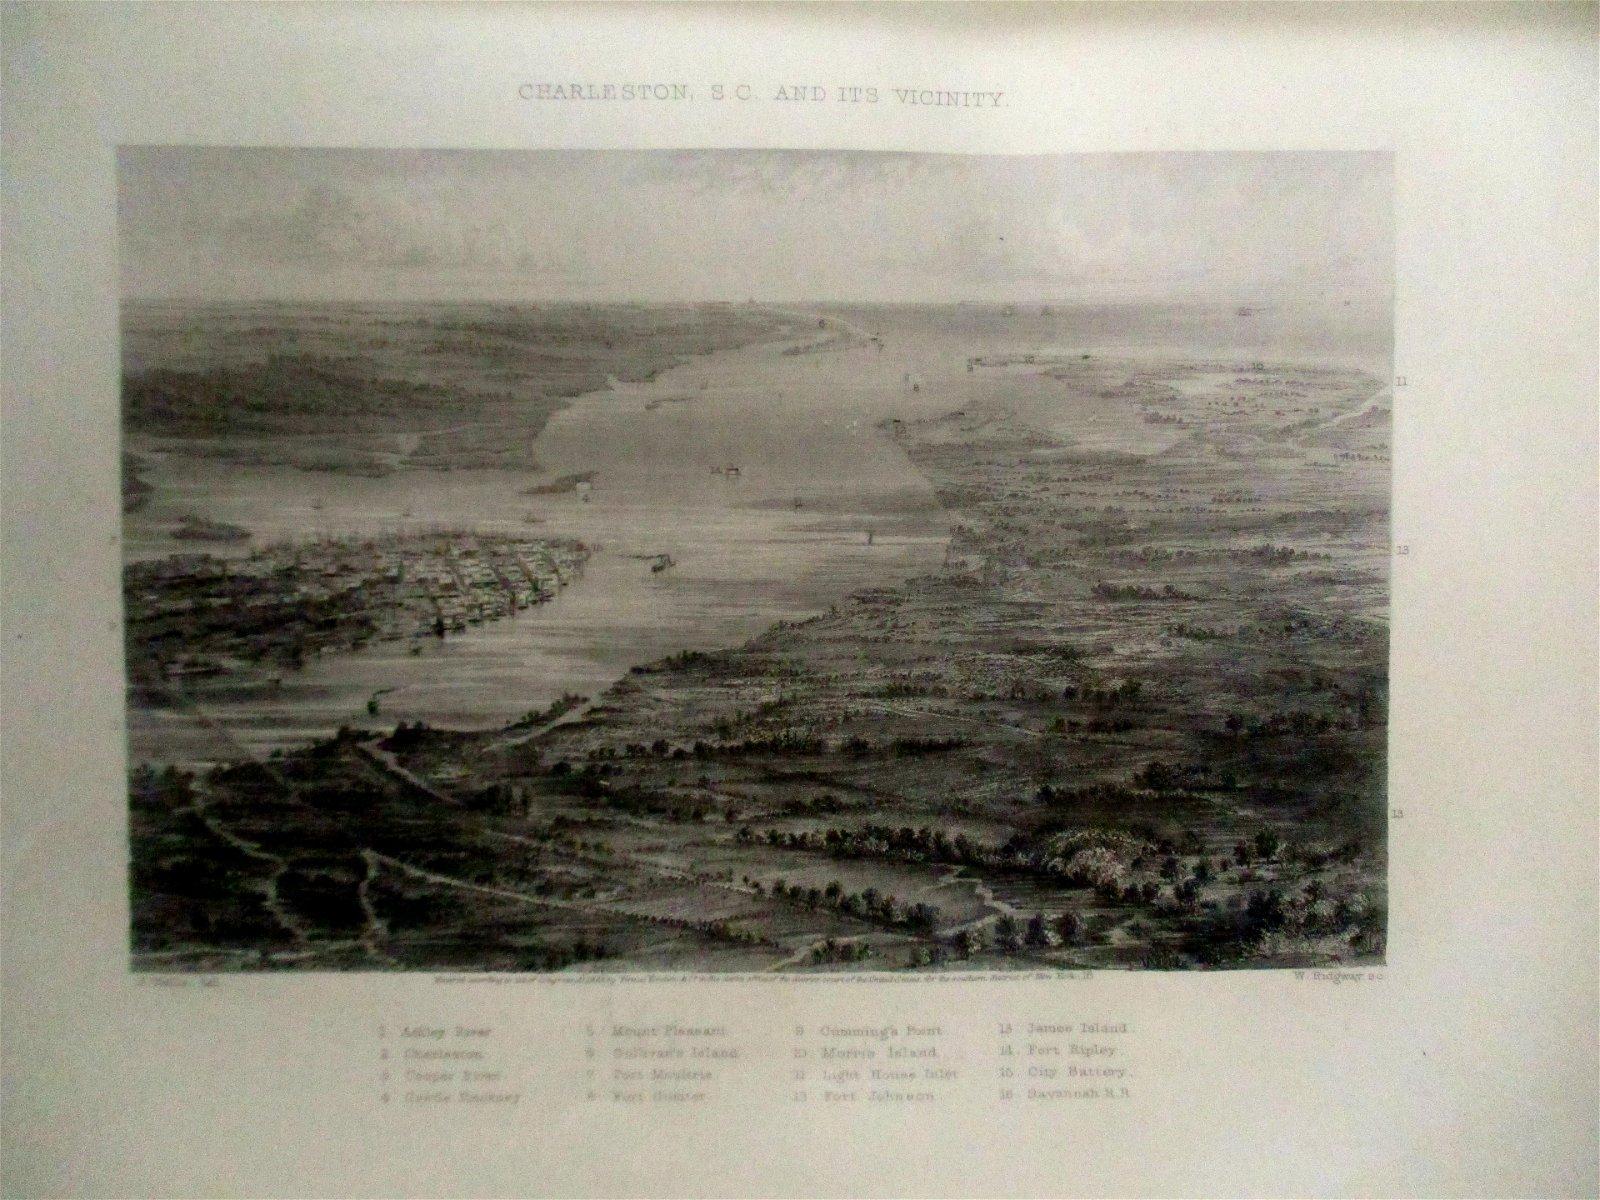 View of Charleston South Carolina [Civil War]